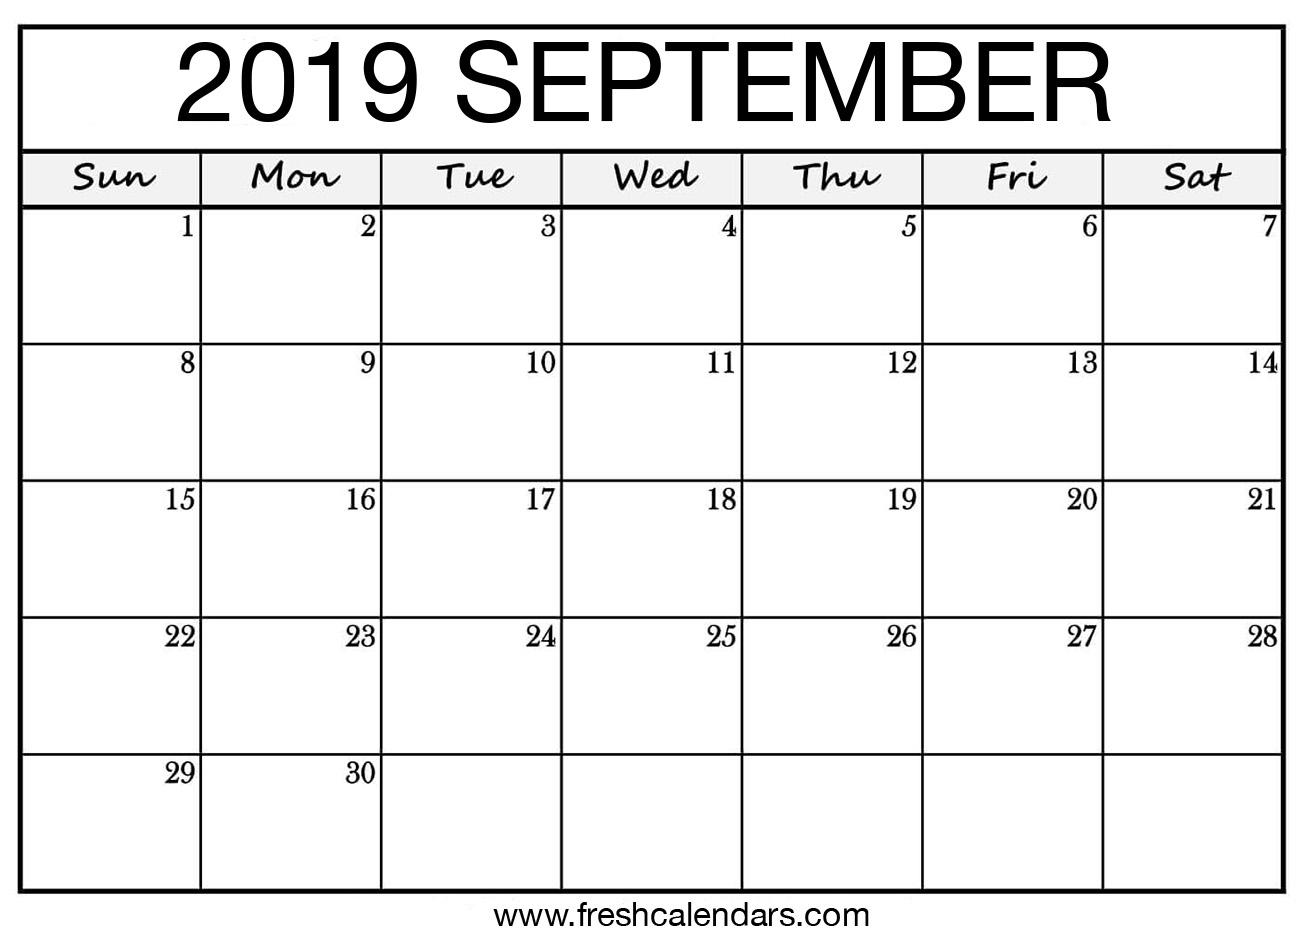 Sept 2019 Calendar Printable.September 2019 Calendar Printable Fresh Calendars